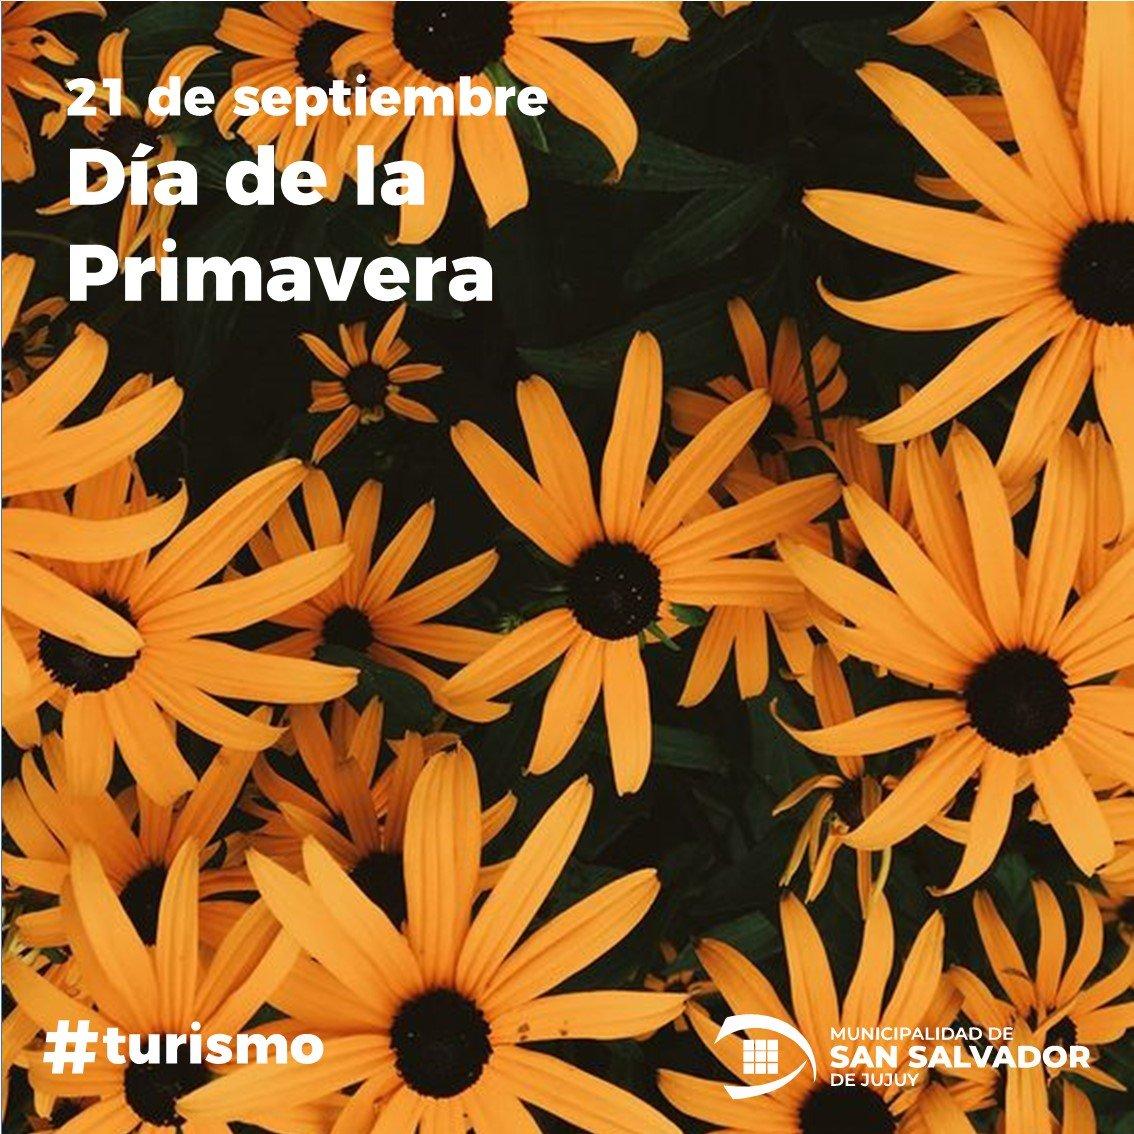 FELIZ DIA DE LA PRIMAVERA.!!!  🌻🌺🏵🌹🥀🌼🌷💮🌸💐 #jujuy #JujuyEnergiaViva #Turismo #VisitJujuy #Argentina #Primavera https://t.co/N7F29zliN6